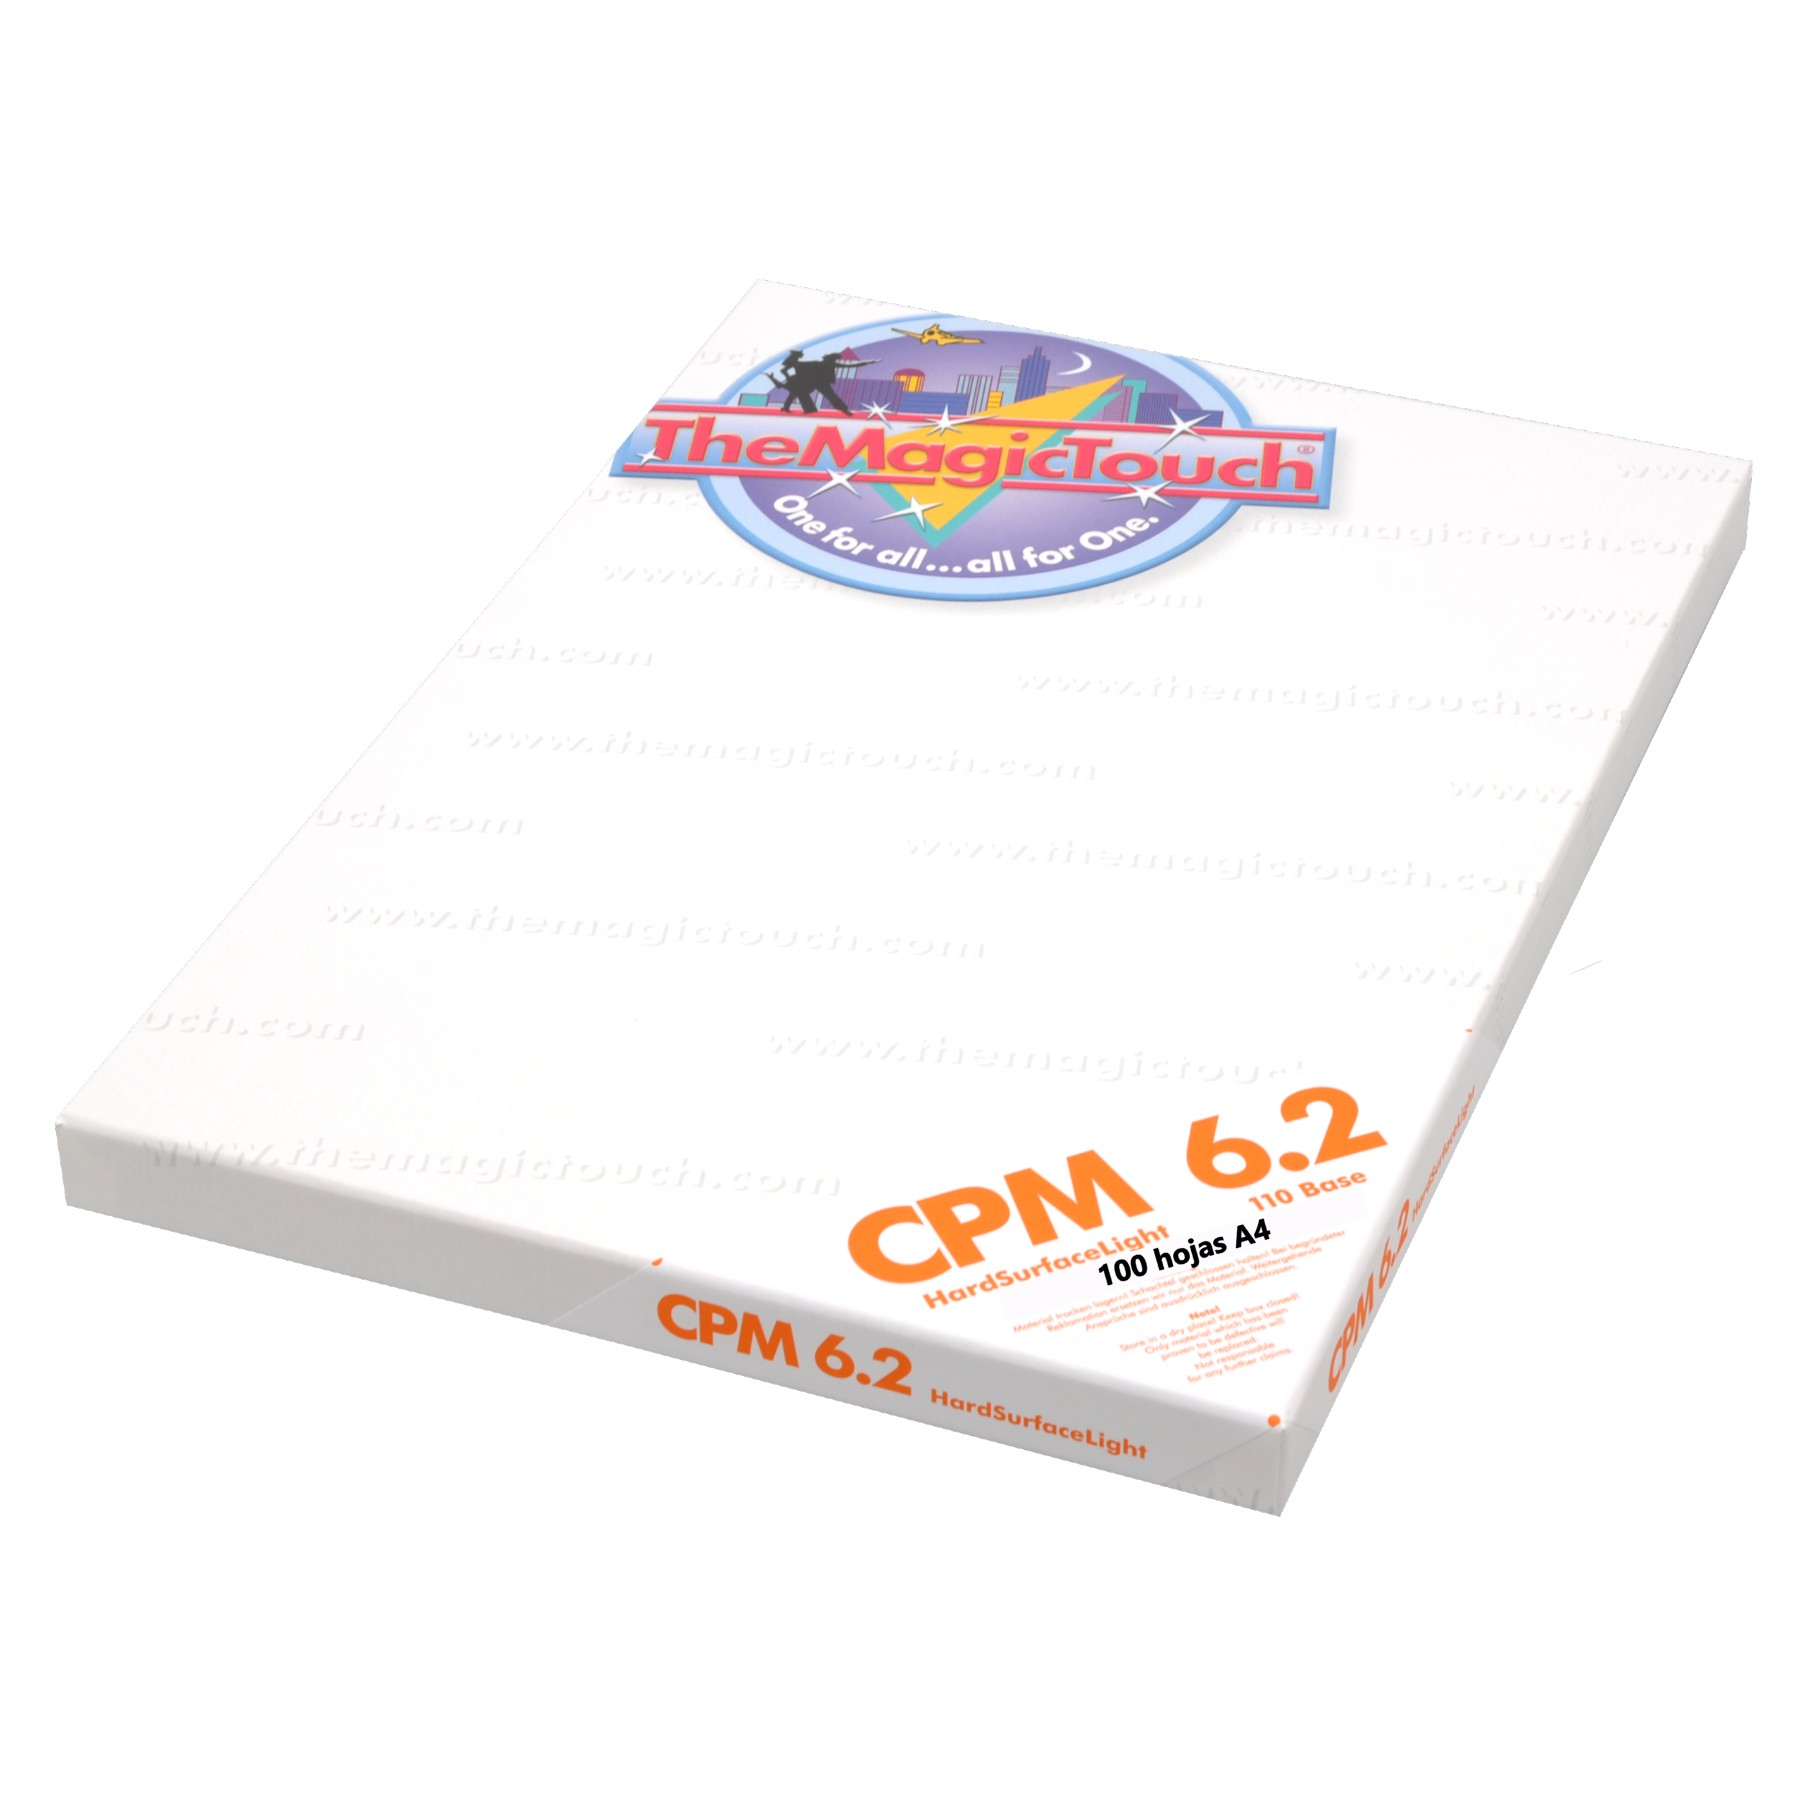 CPM 6.2 Transfer superficies rígidas no textiles, 100 hojas A4